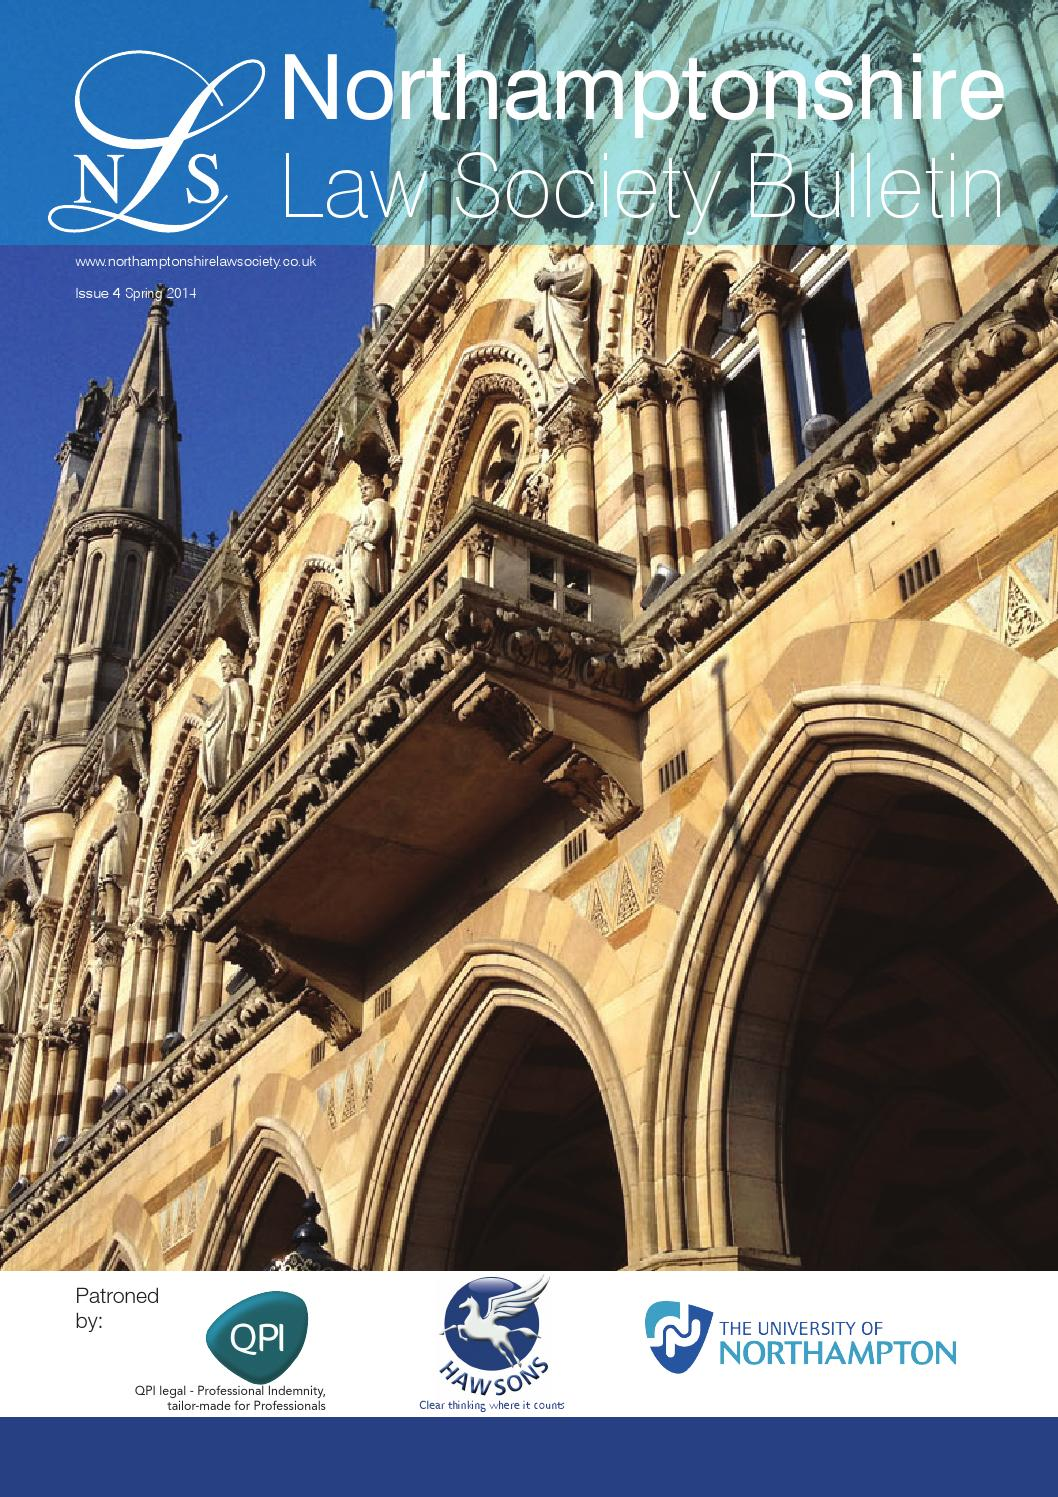 Northamptonshire Law Society Bulletin by EPC Studio - issuu